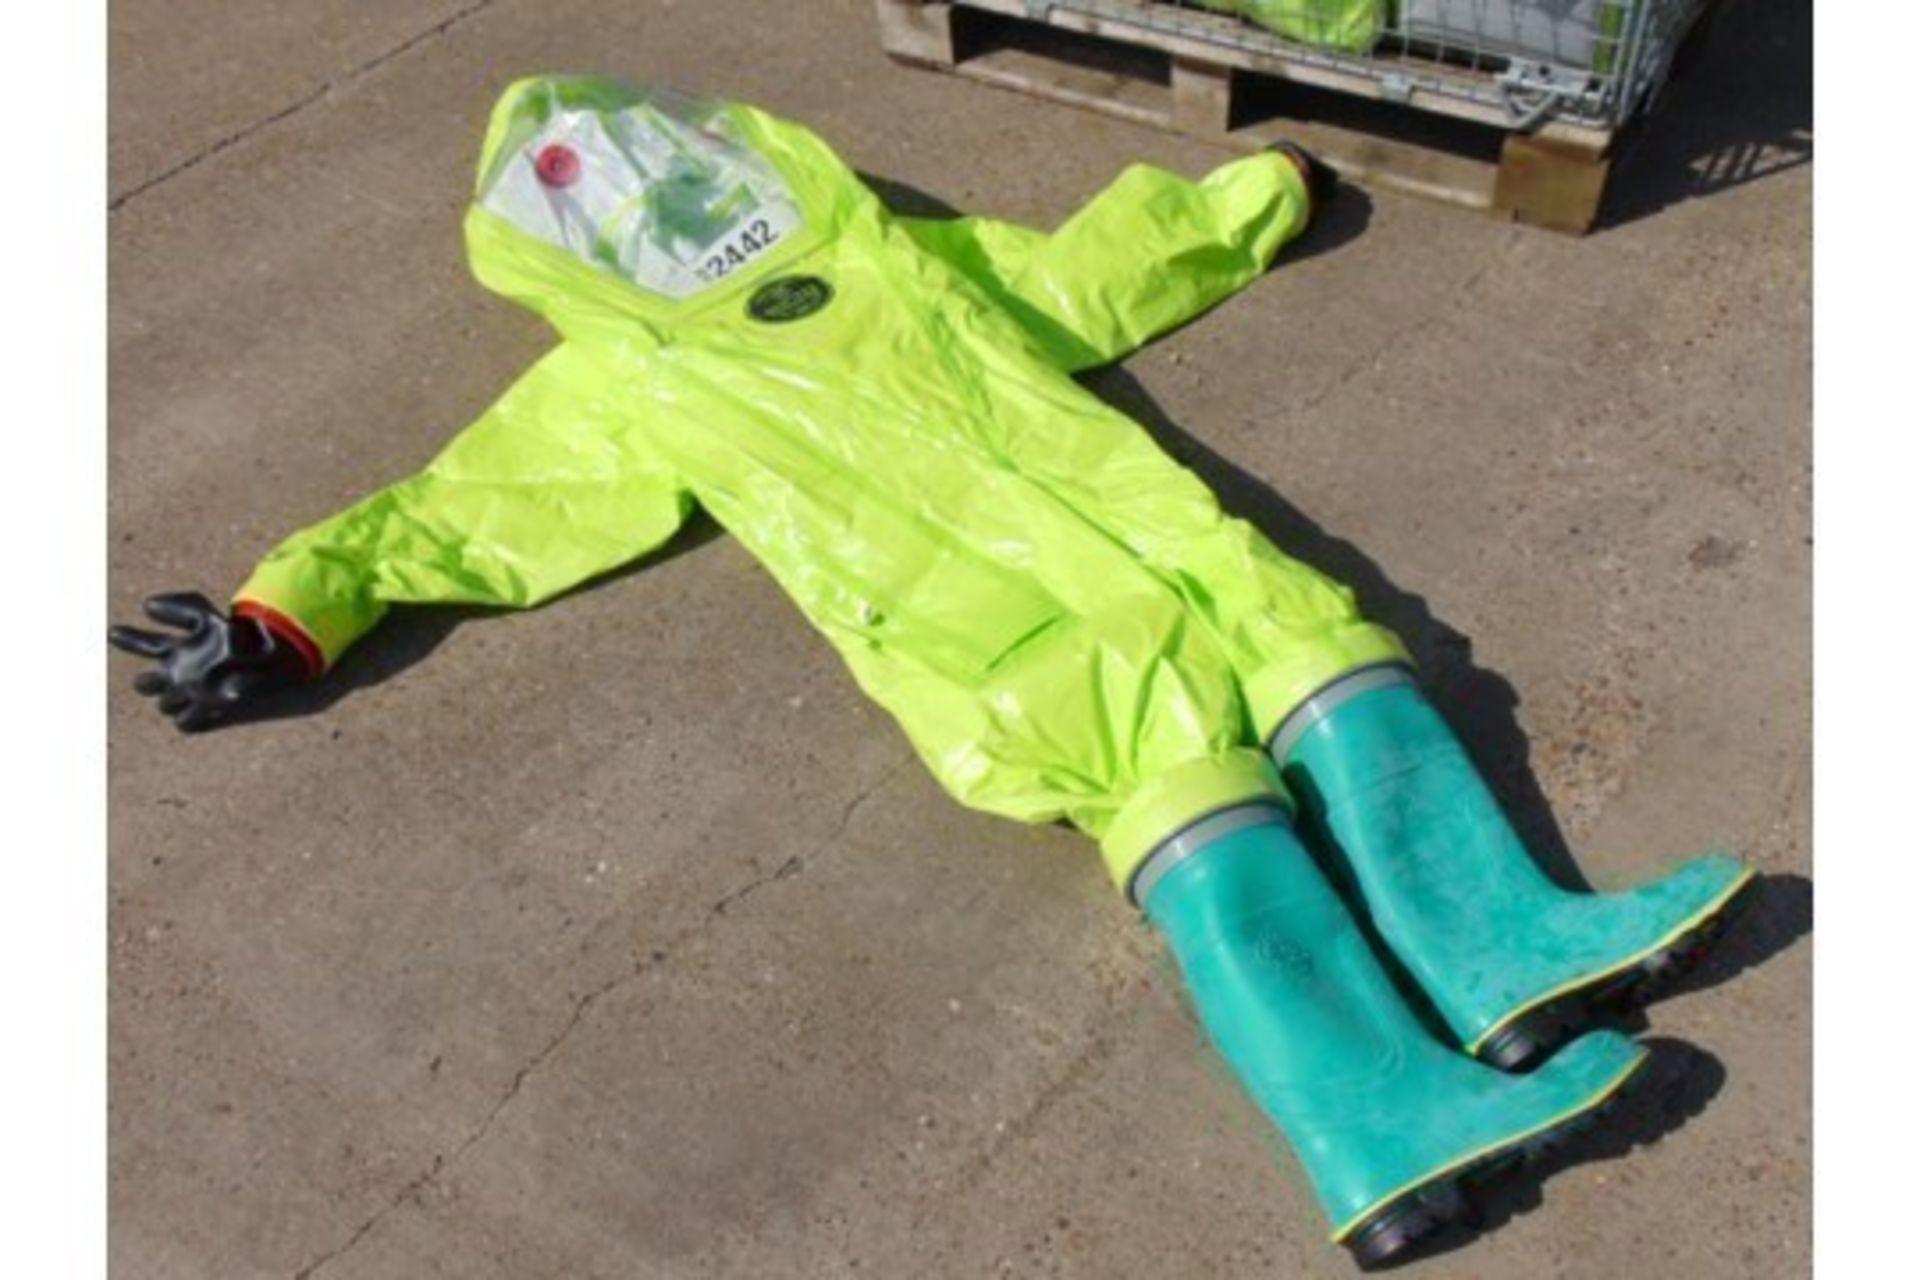 Lot 26803 - Q10 x Unissued Respirex Tychem TK Gas-Tight Hazmat Suit. Size Large